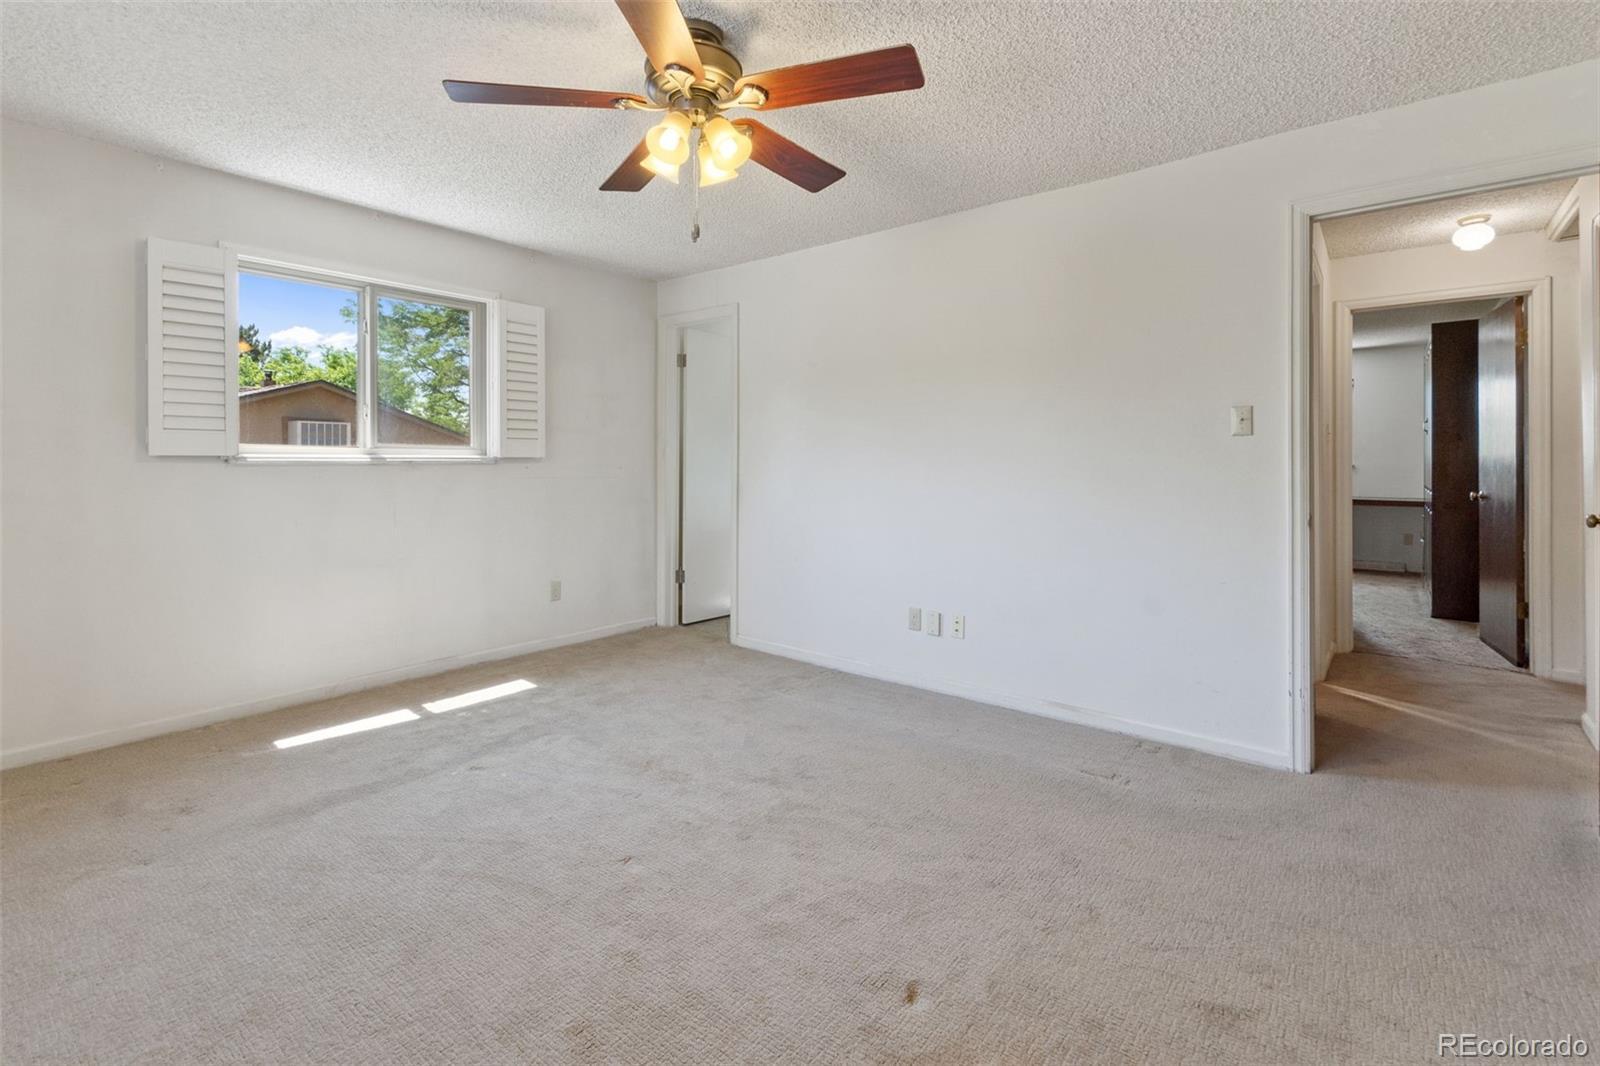 MLS# 7770404 - 23 - 2355 S Hoyt Street, Lakewood, CO 80227